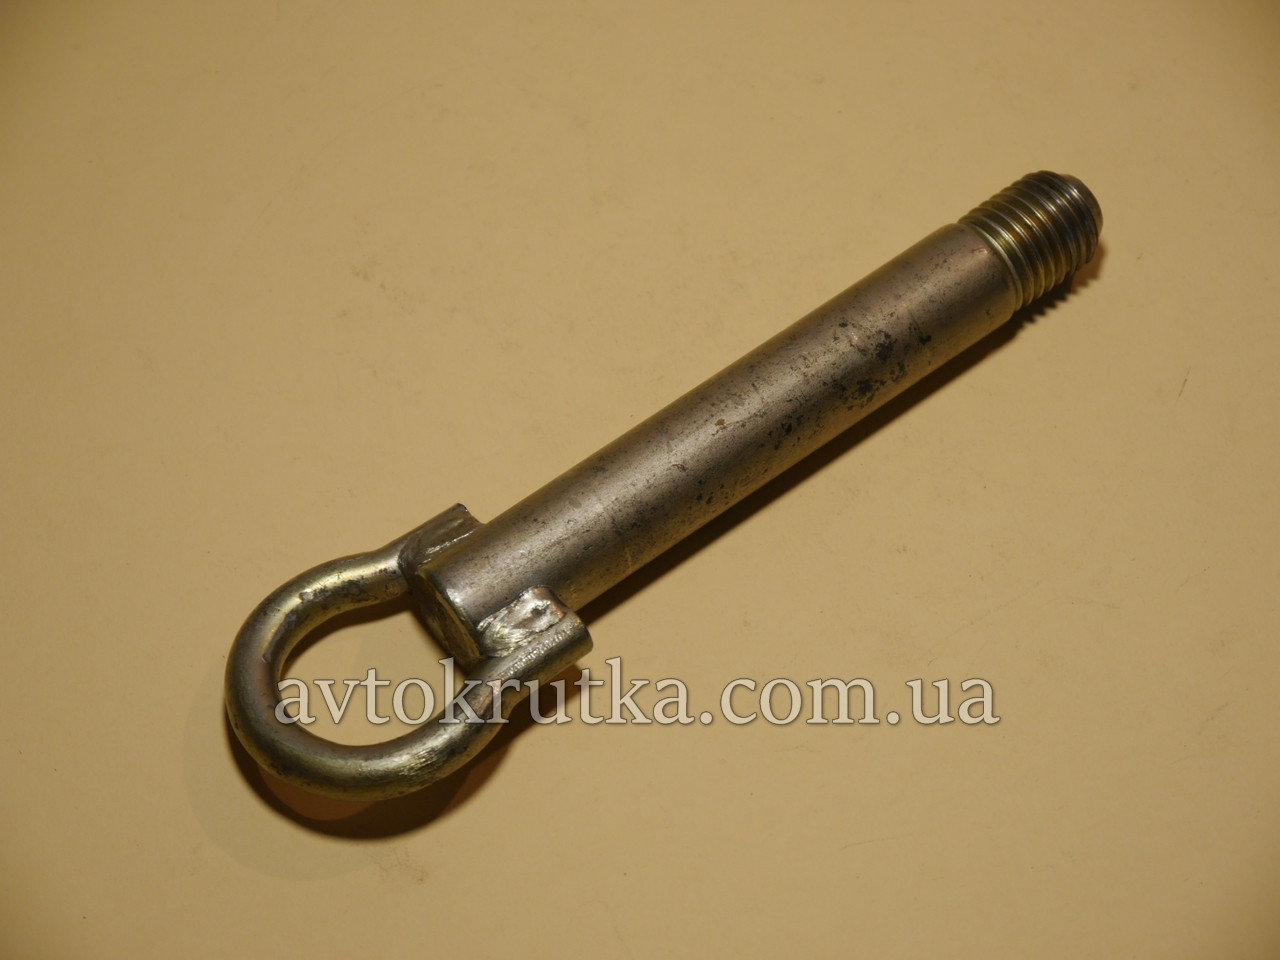 Буксировочный крюк Mazda 2 (Мазда 2) C23750EJ0